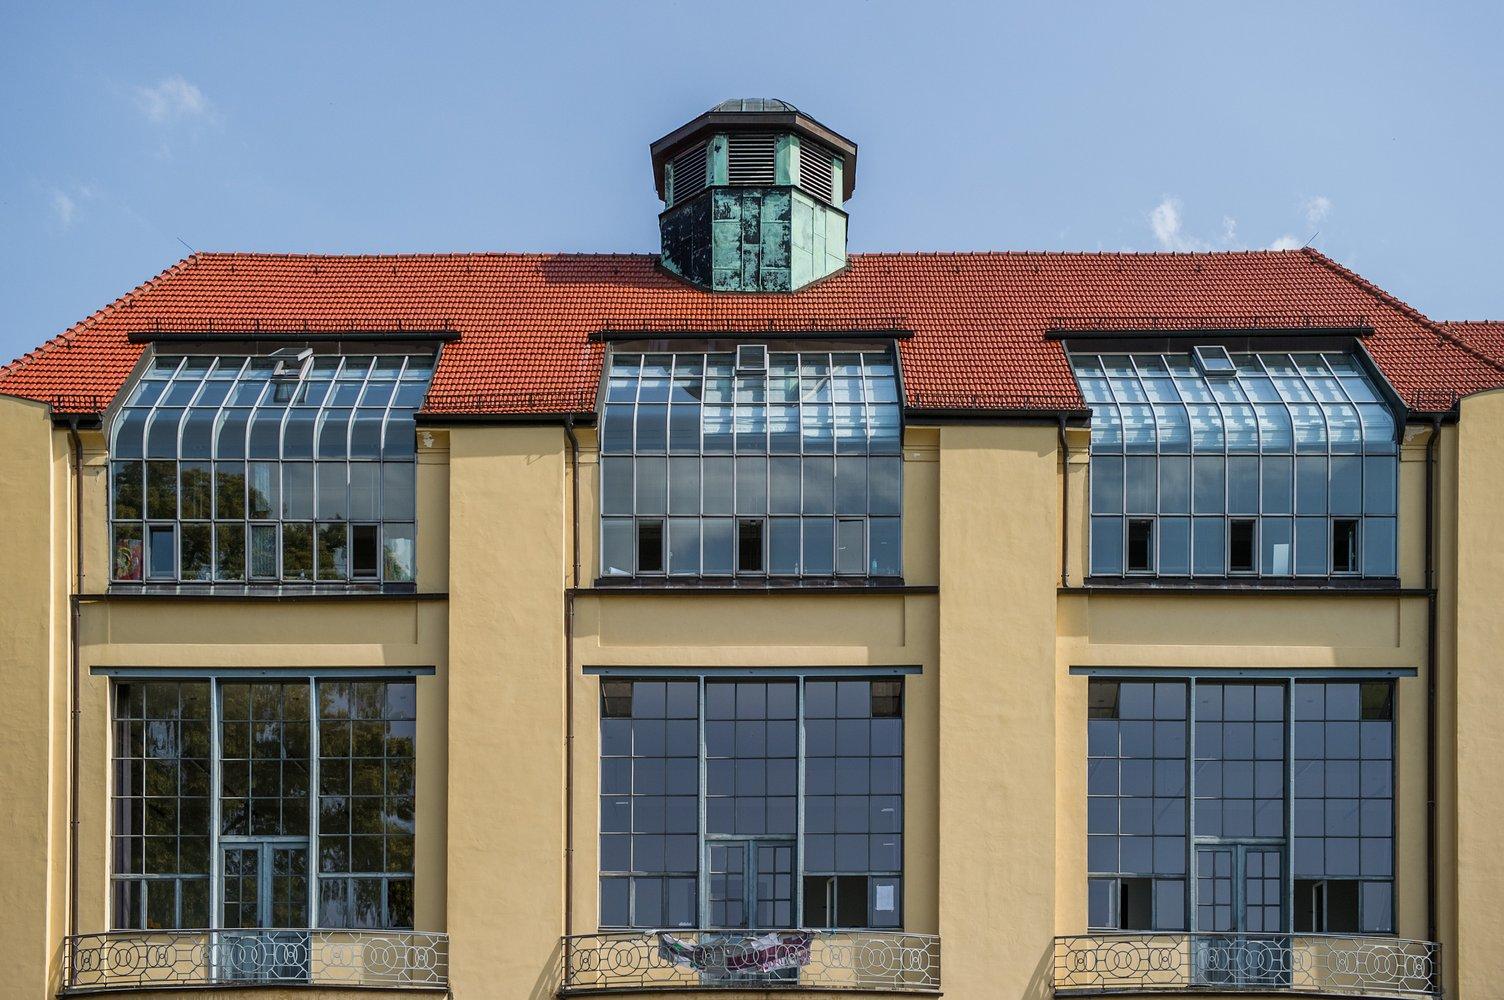 Bauhaus Universitat Weimar Invitation To Exchange Views